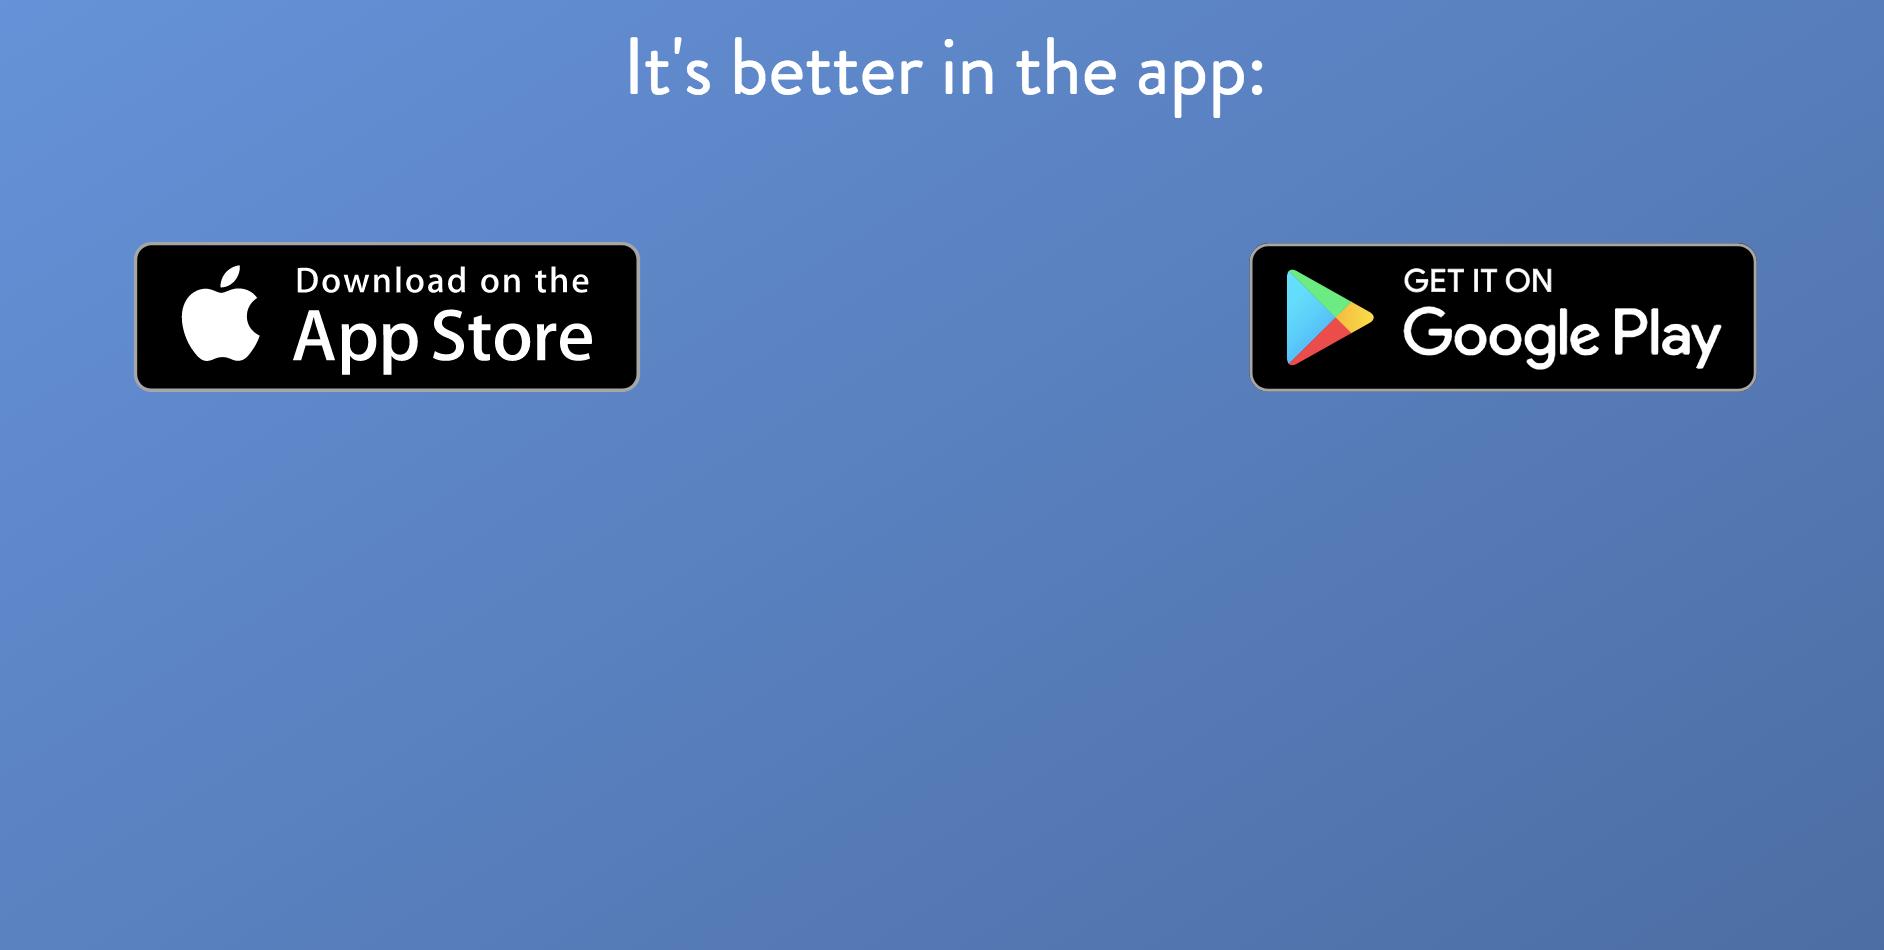 https://github.com/rizzomichaelg/react-mobile-store-button/blob/master/img/example.png?raw=true